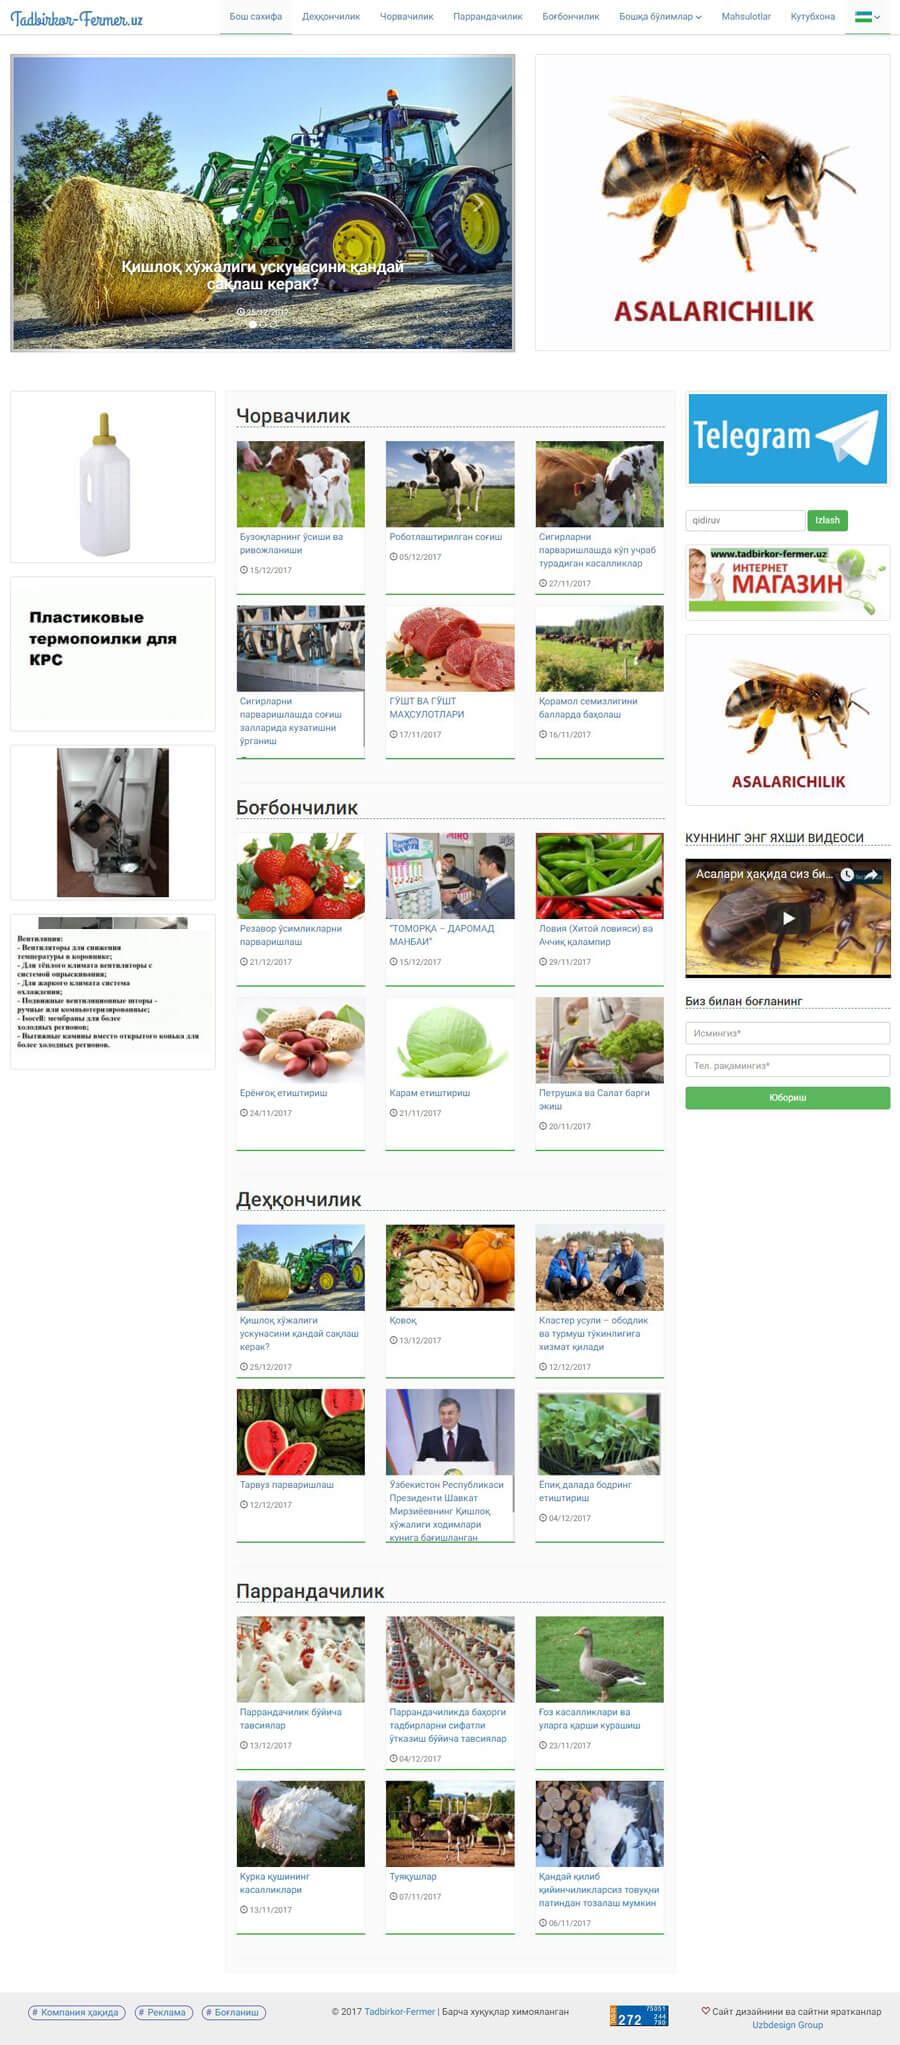 Development of website design and website development for Tadbirkor-Fermer.uz